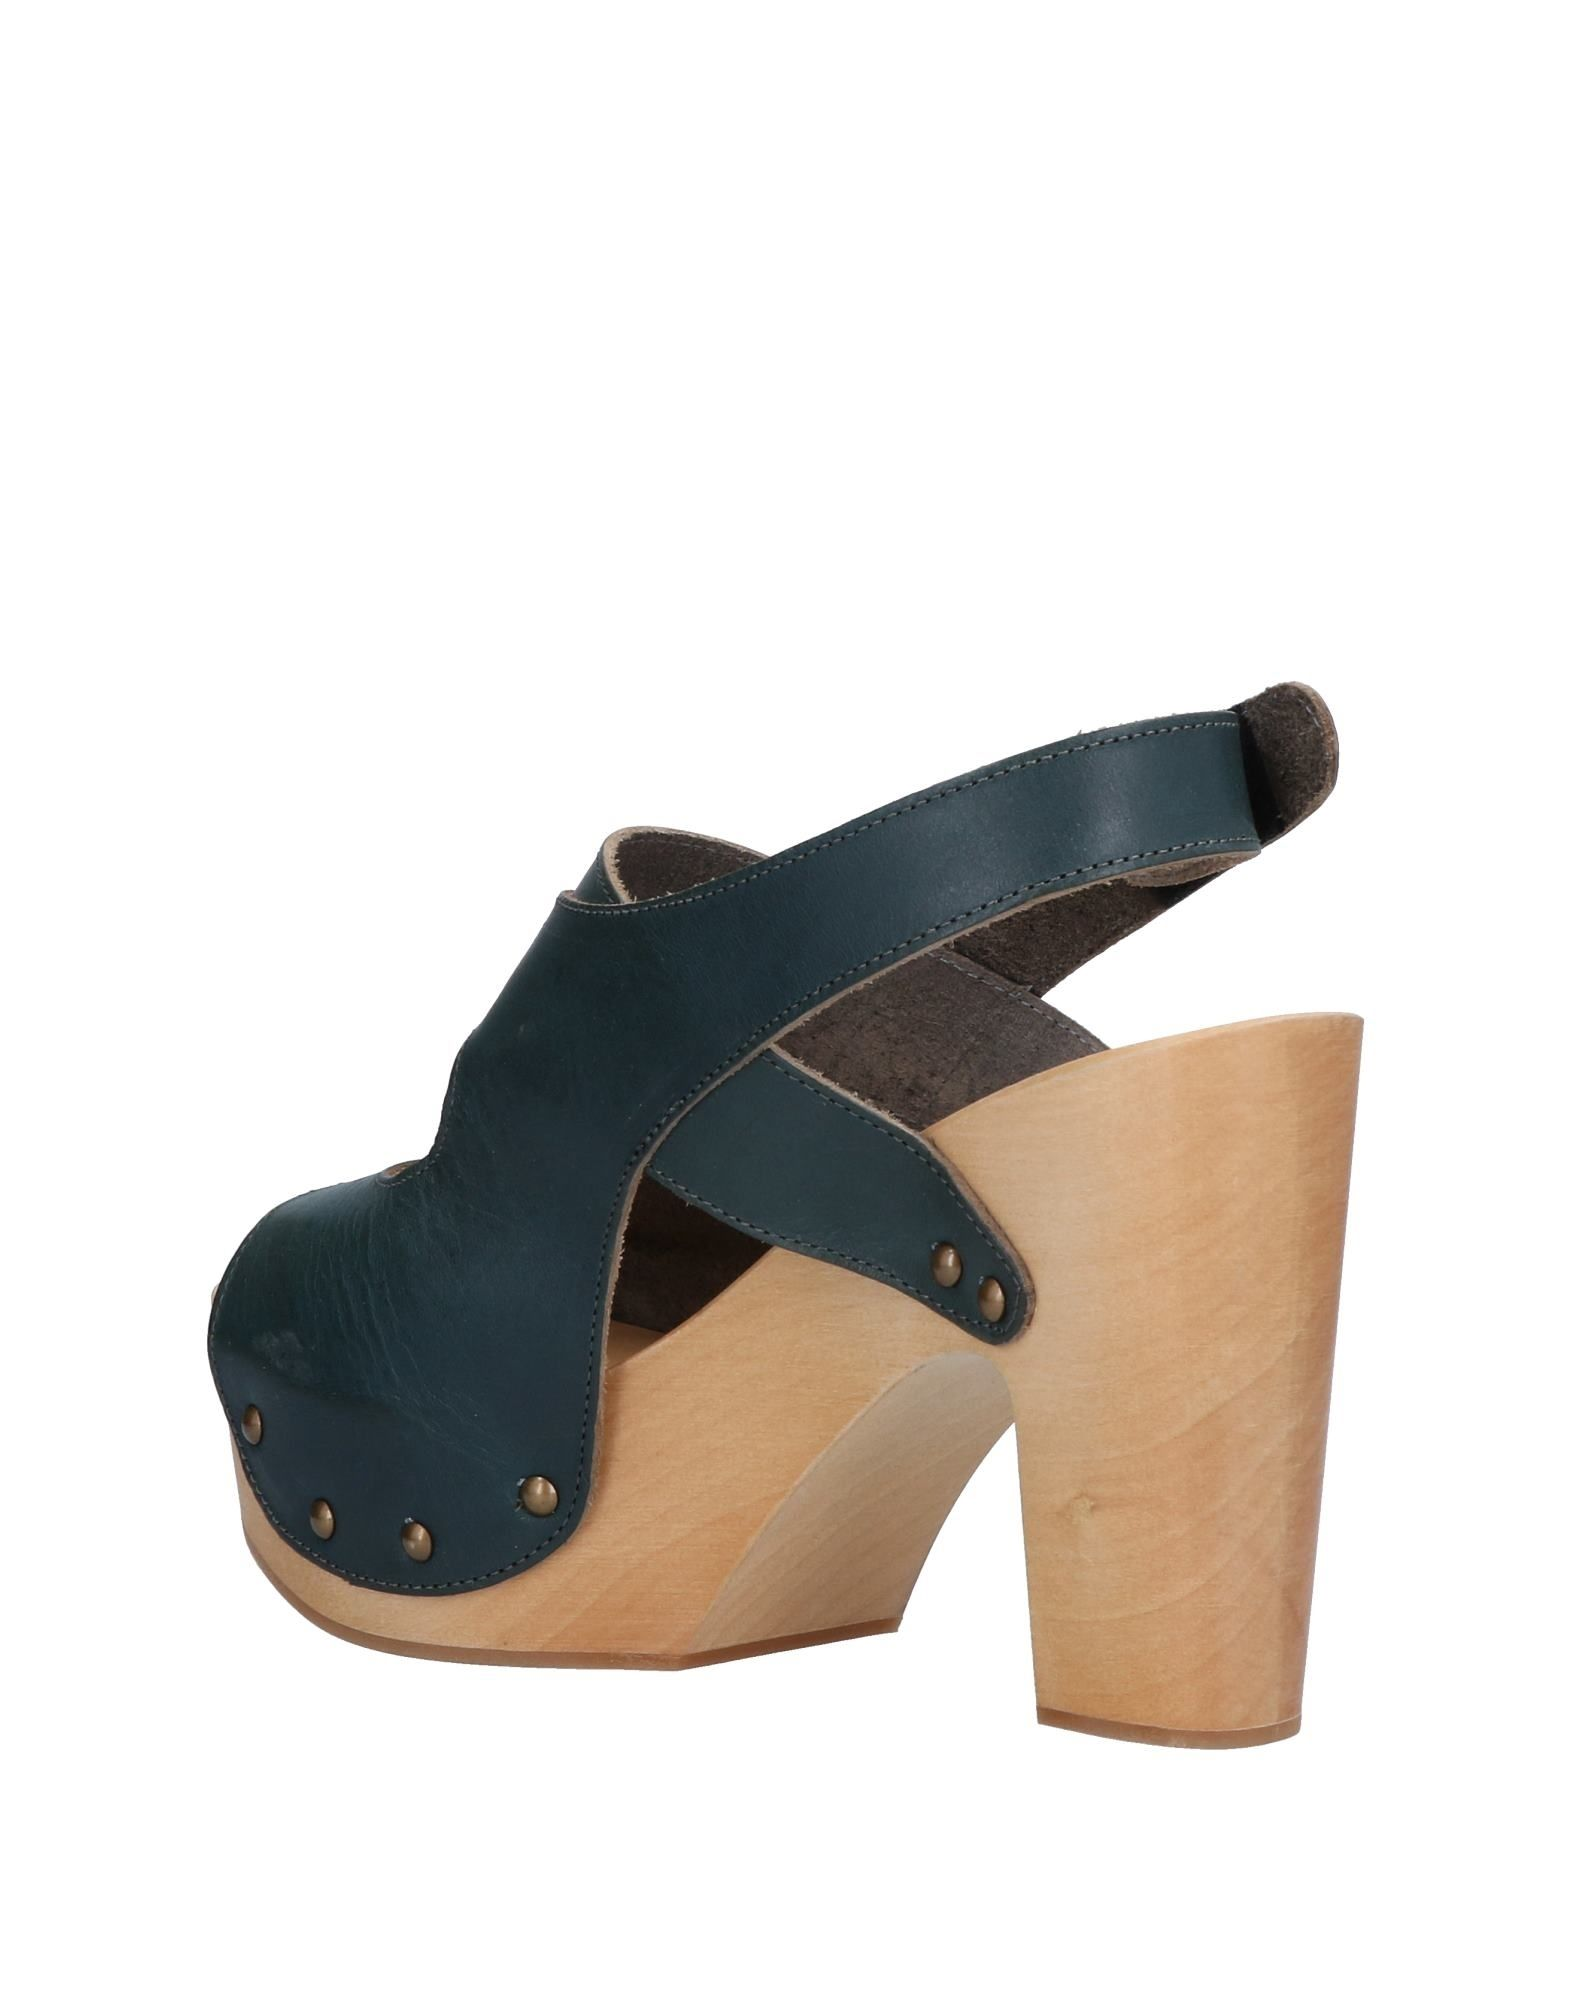 Antidoti Schuhe Sandalen Damen  11495155JJ Gute Qualität beliebte Schuhe Antidoti 964577